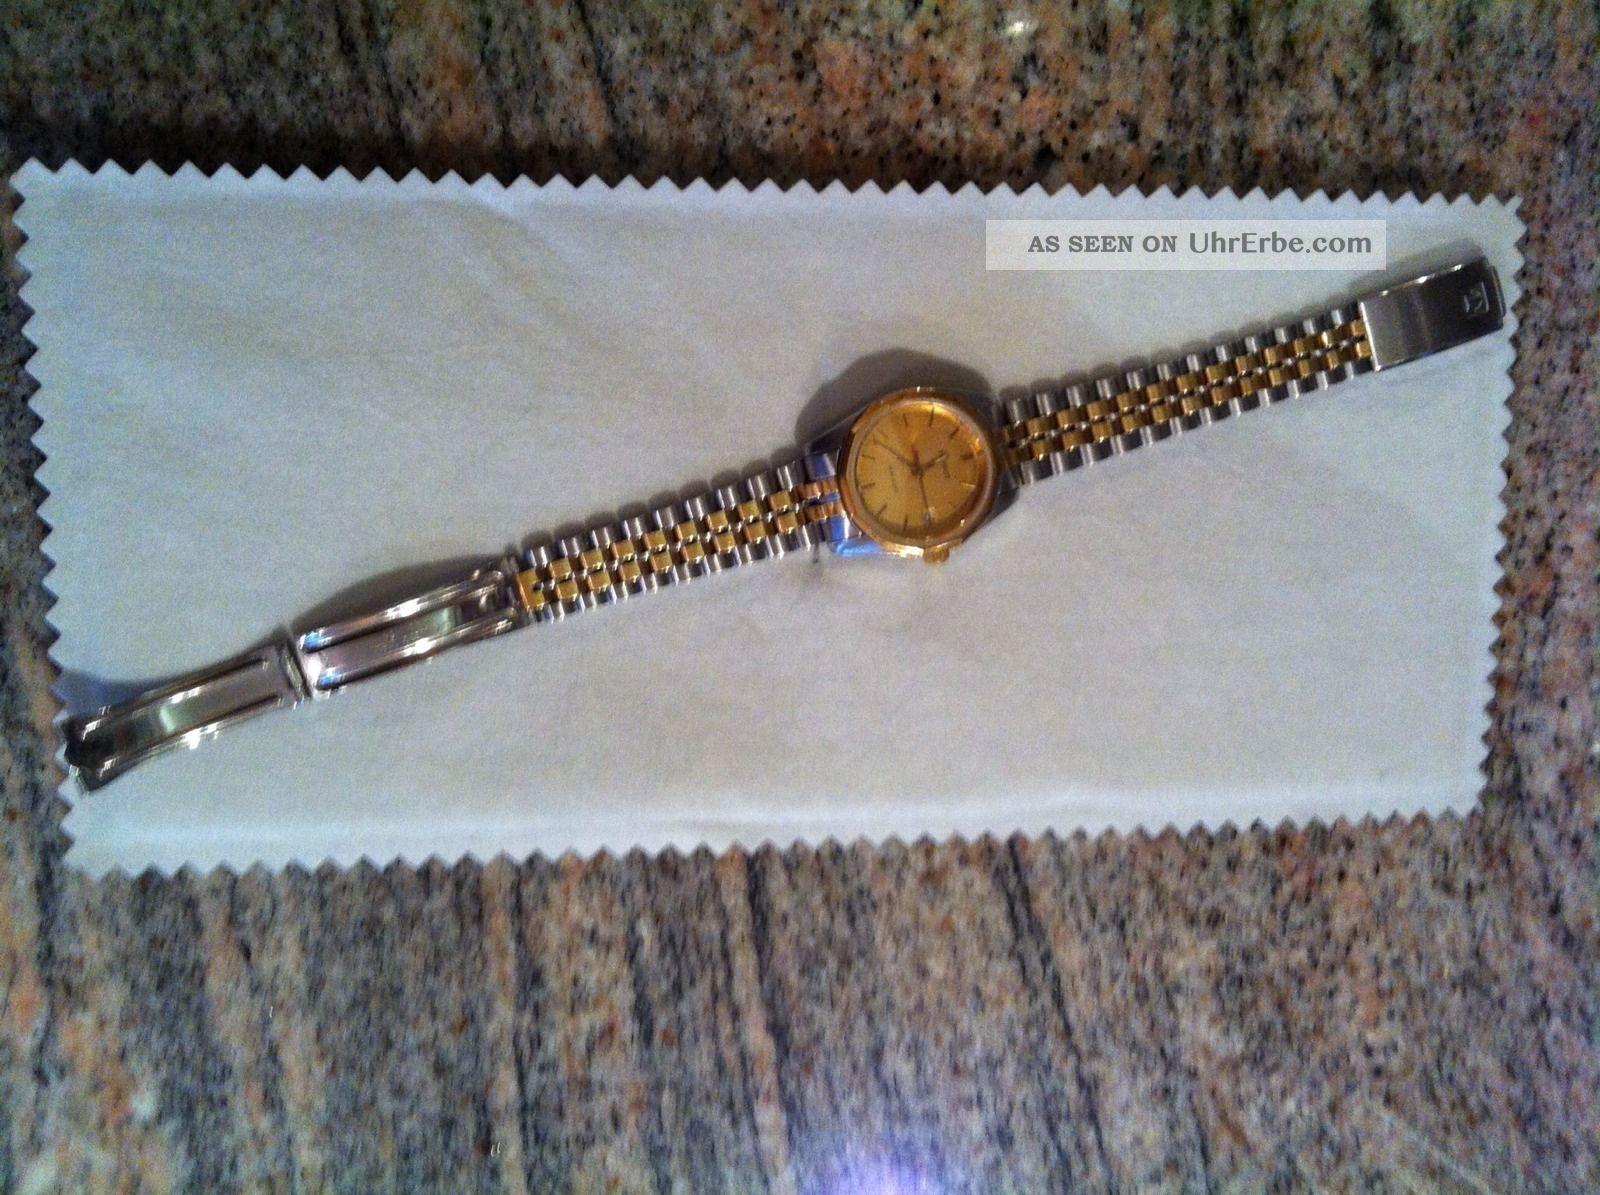 Tissot Pr 100 Armbanduhr Damenuhr Uhr Bicolor Gold Silber Von Christ Armbanduhren Bild